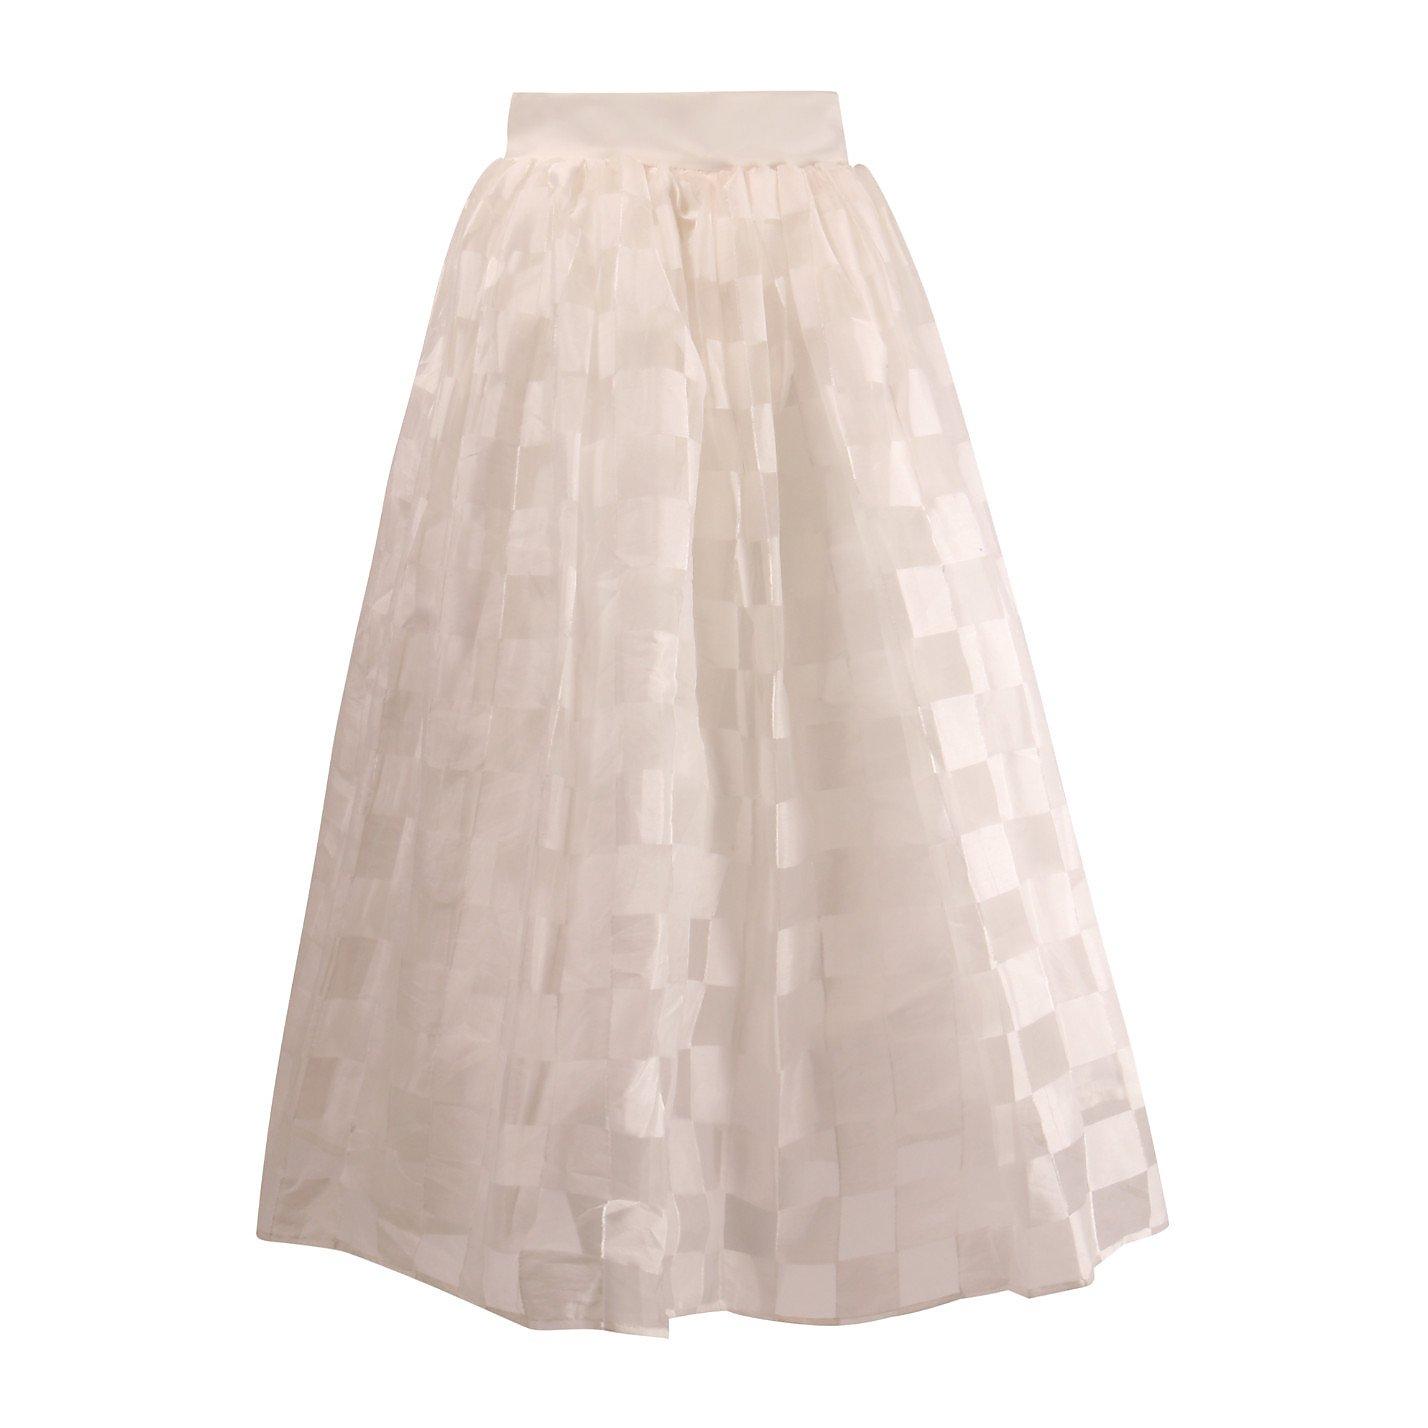 poca & poca Sheer Check-Patterned A-Line Skirt